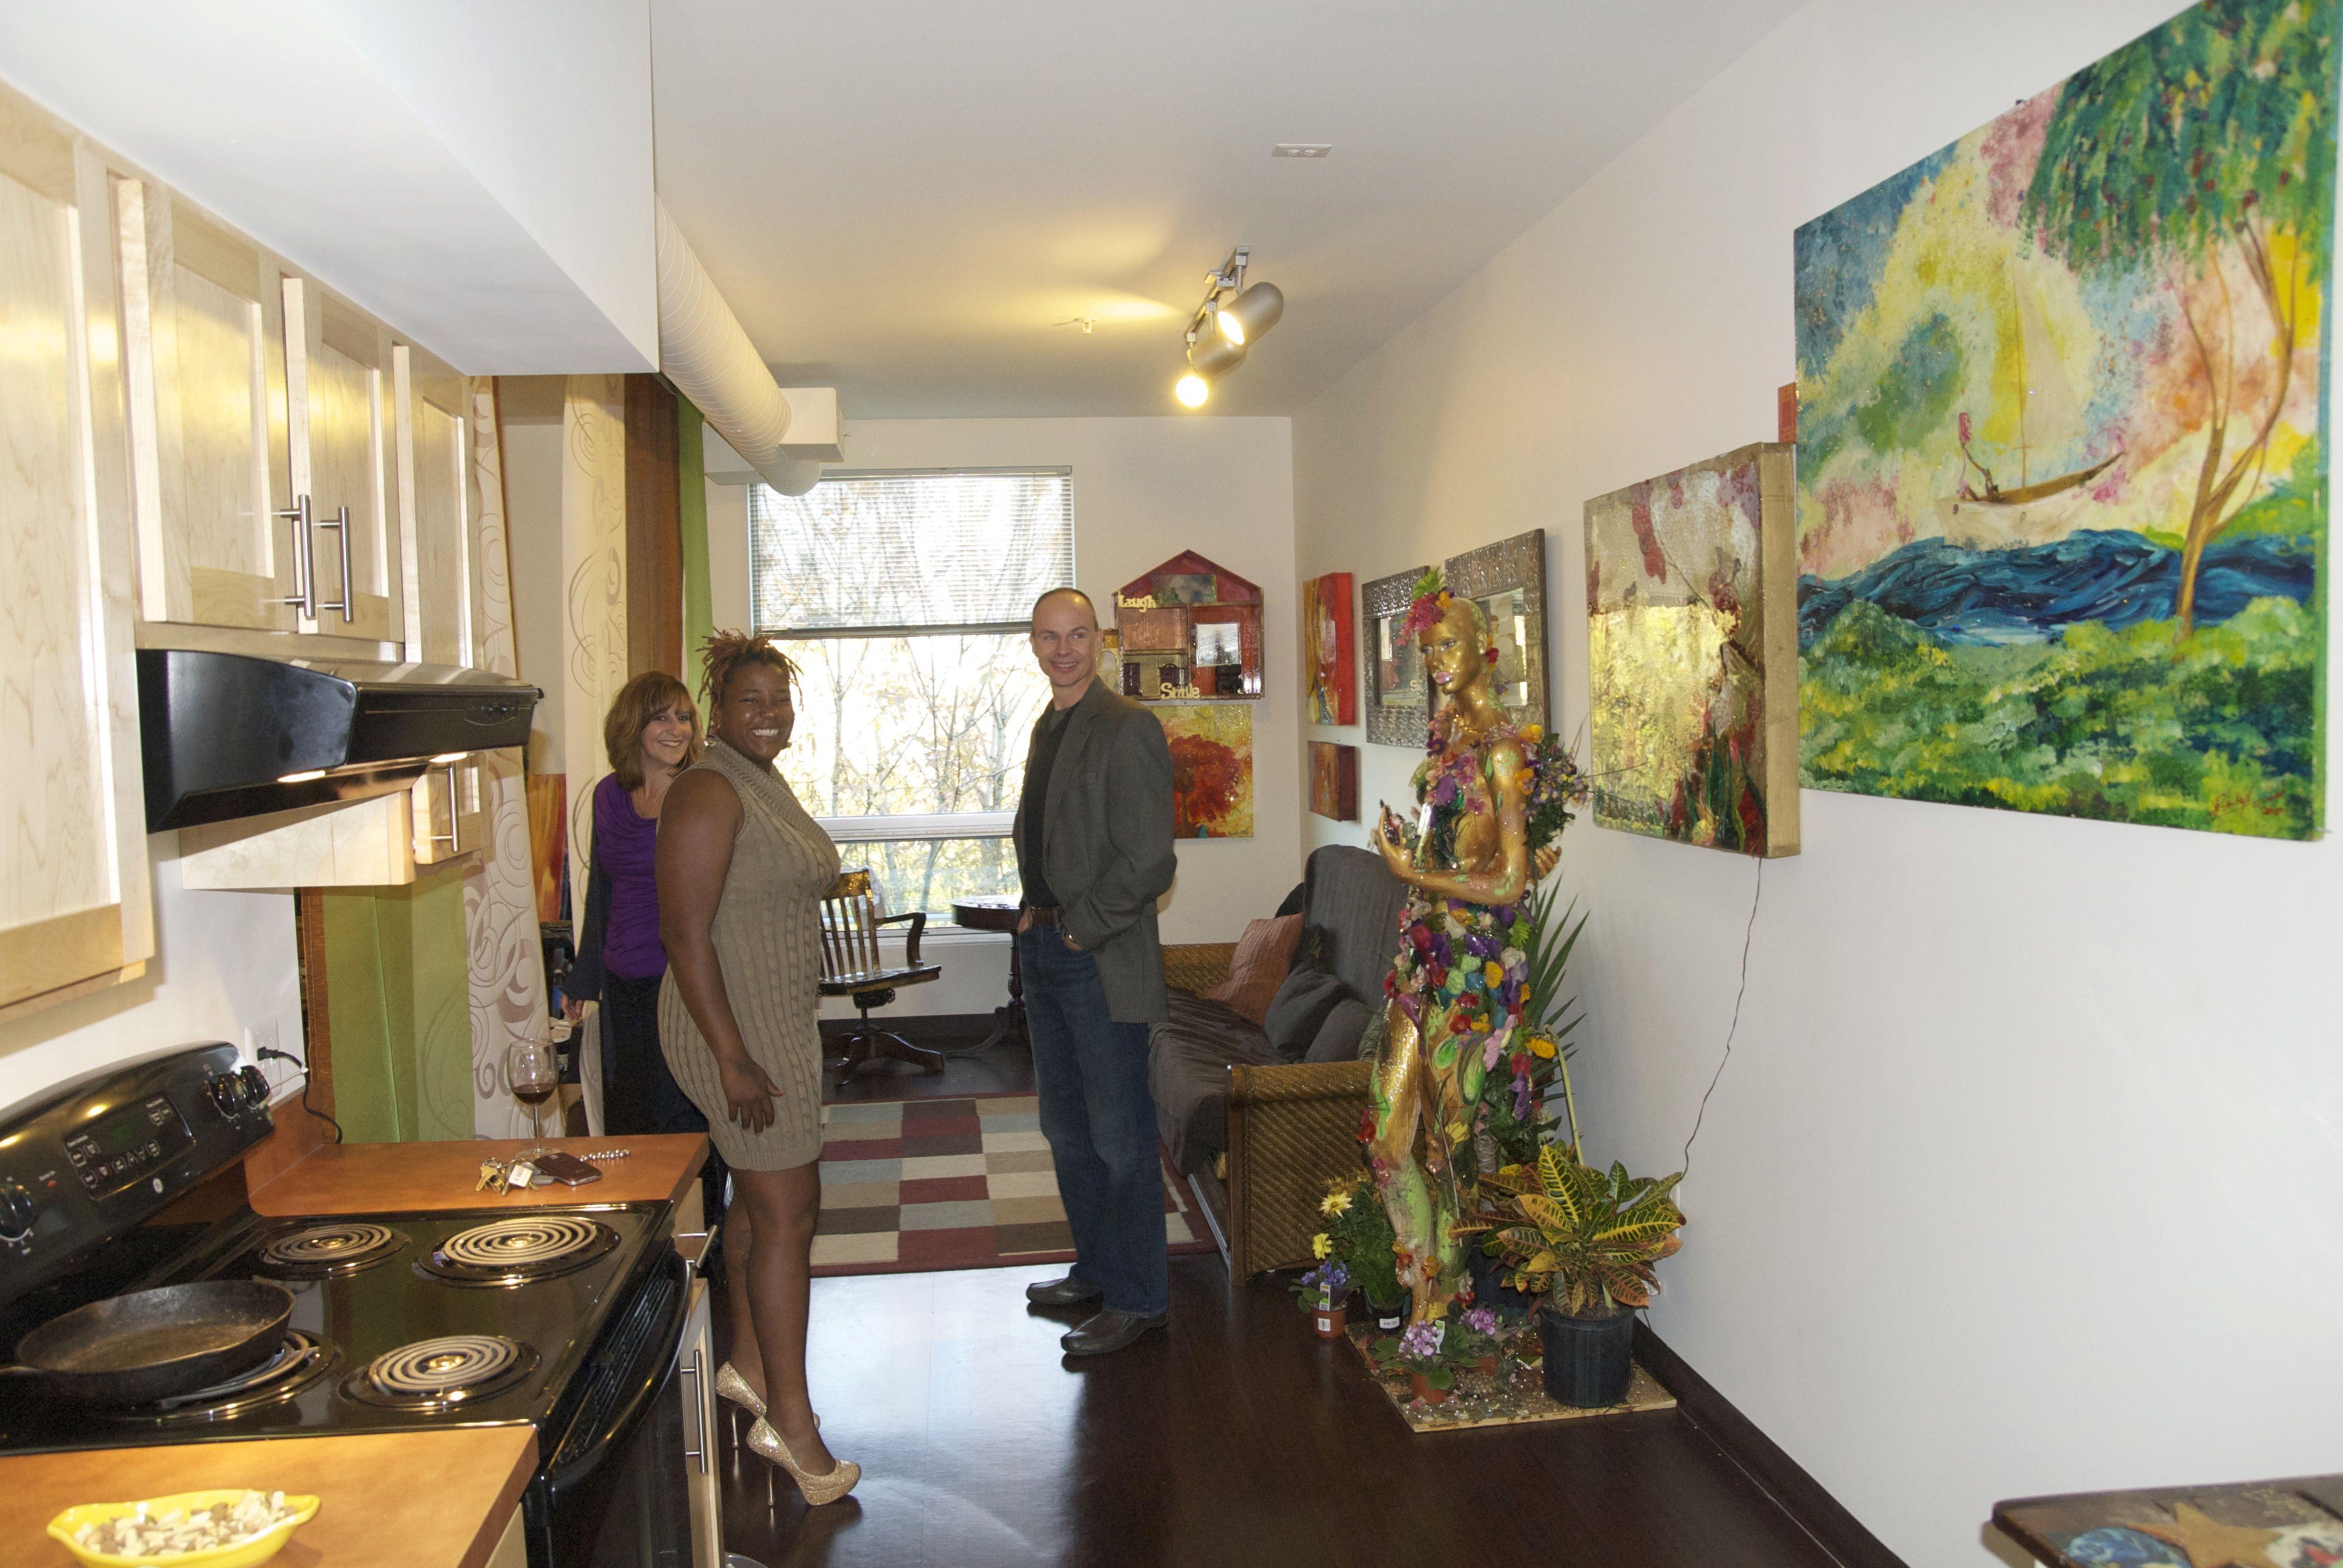 Brookland Artspace Lofts, DC | Art crawls around the country